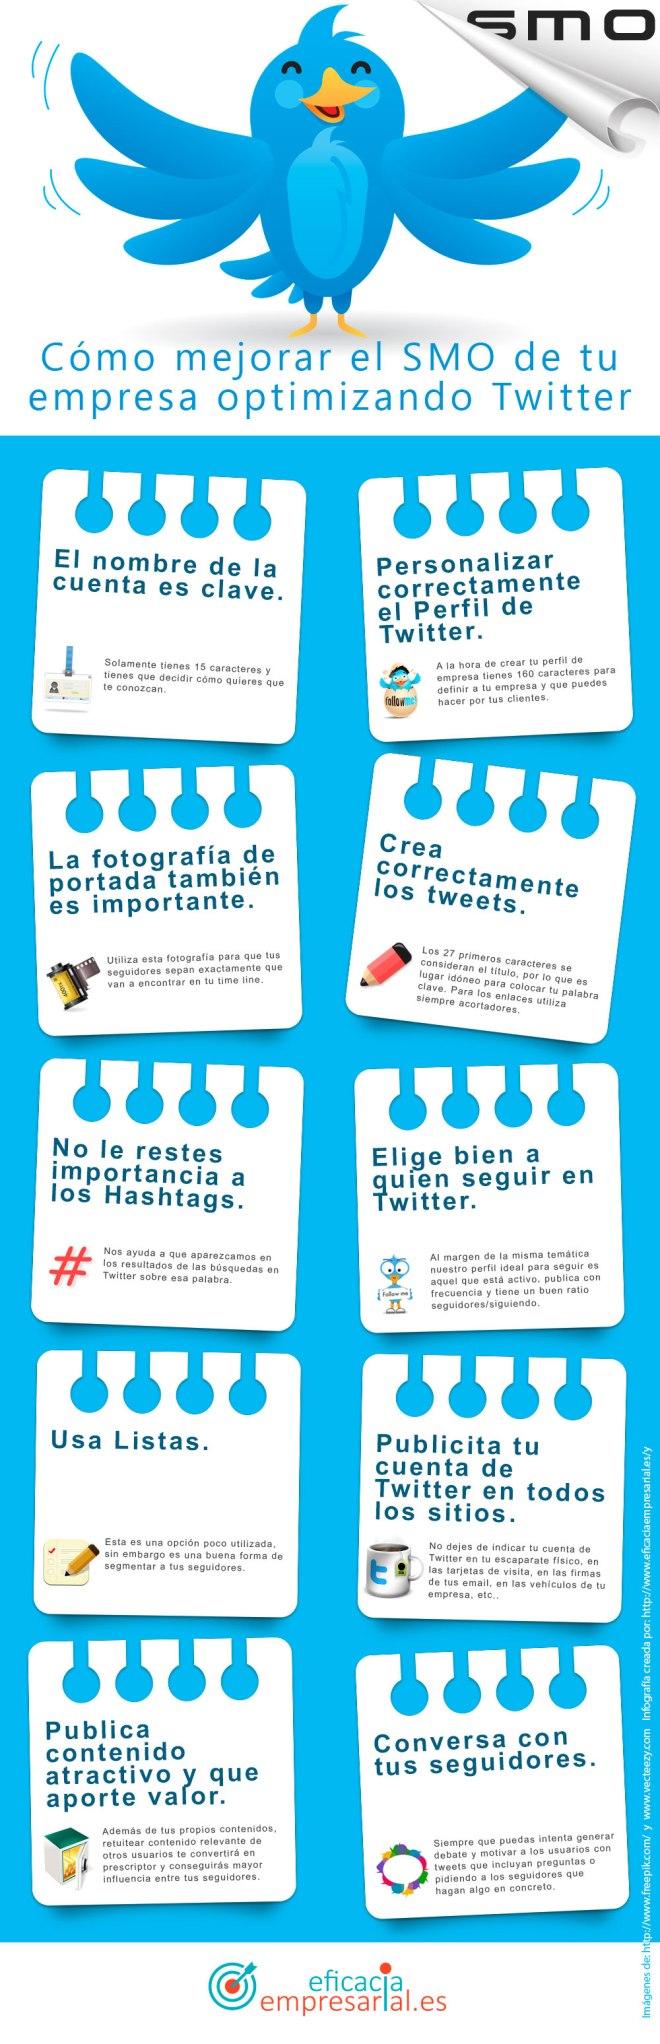 Optimiza el SMO de tu empresa optimizando Twitter